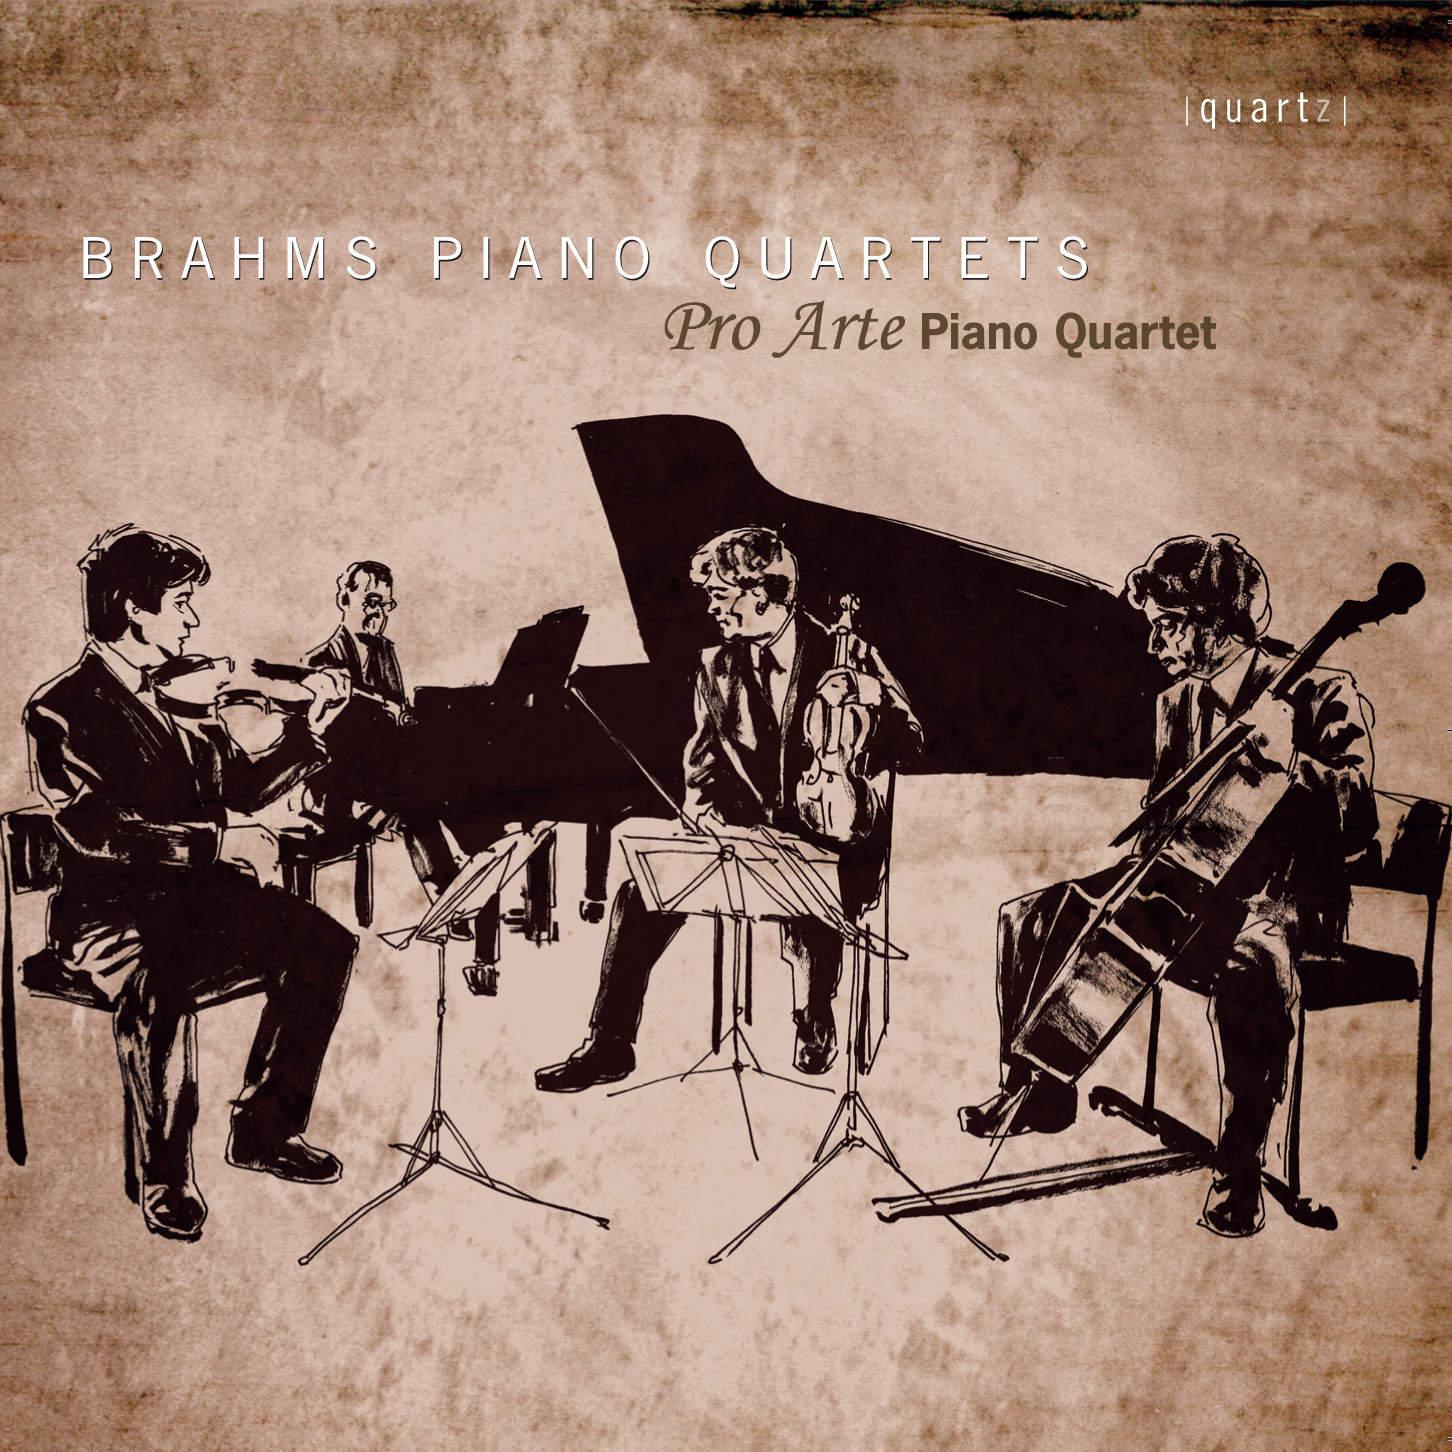 Pro Arte Piano Quartet